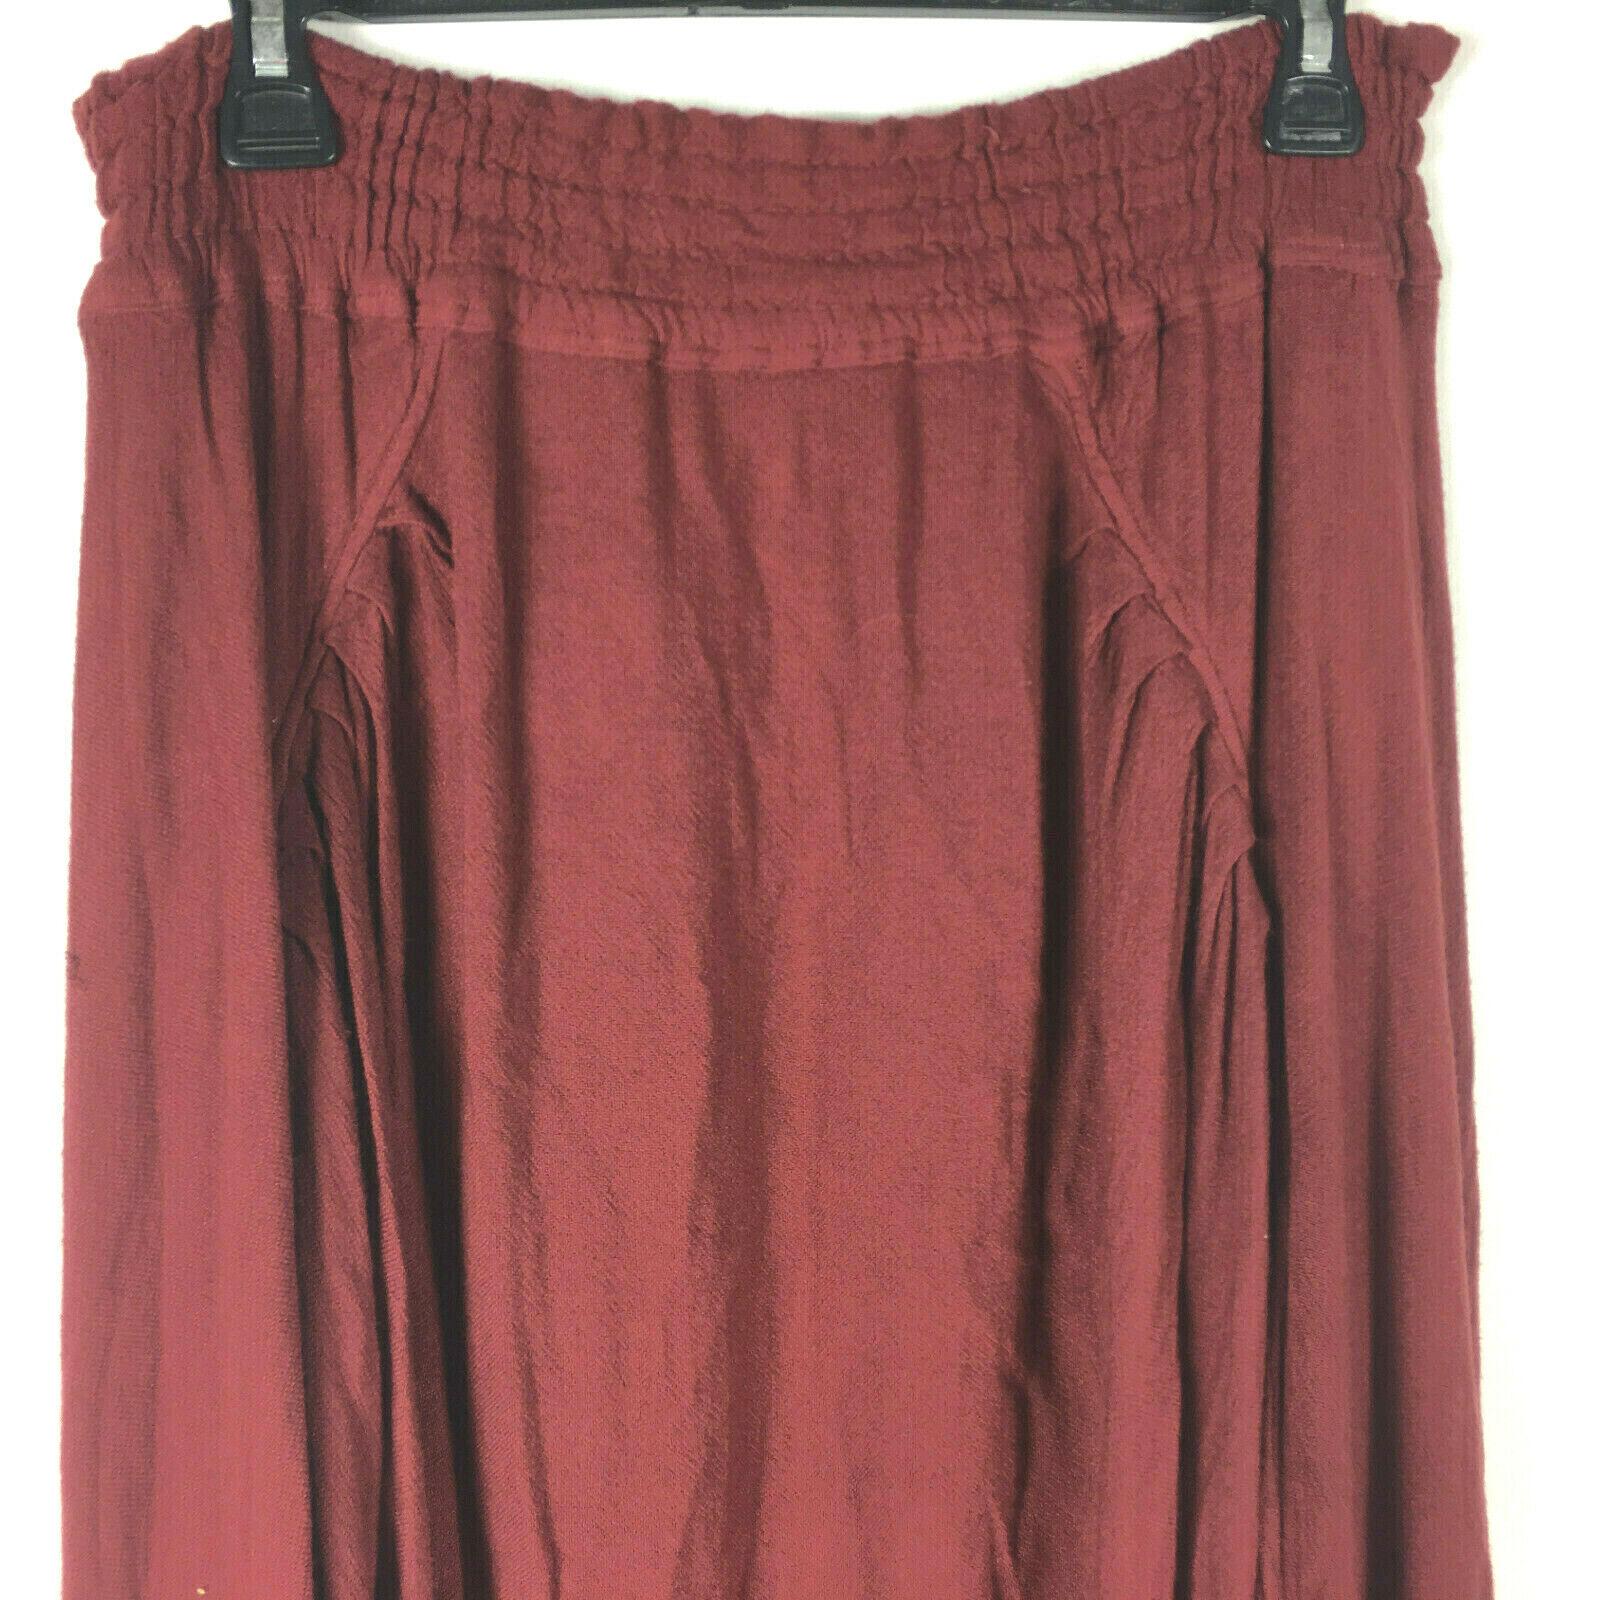 Laise Adzer Skirt Women's Small Medium Large Lage… - image 5